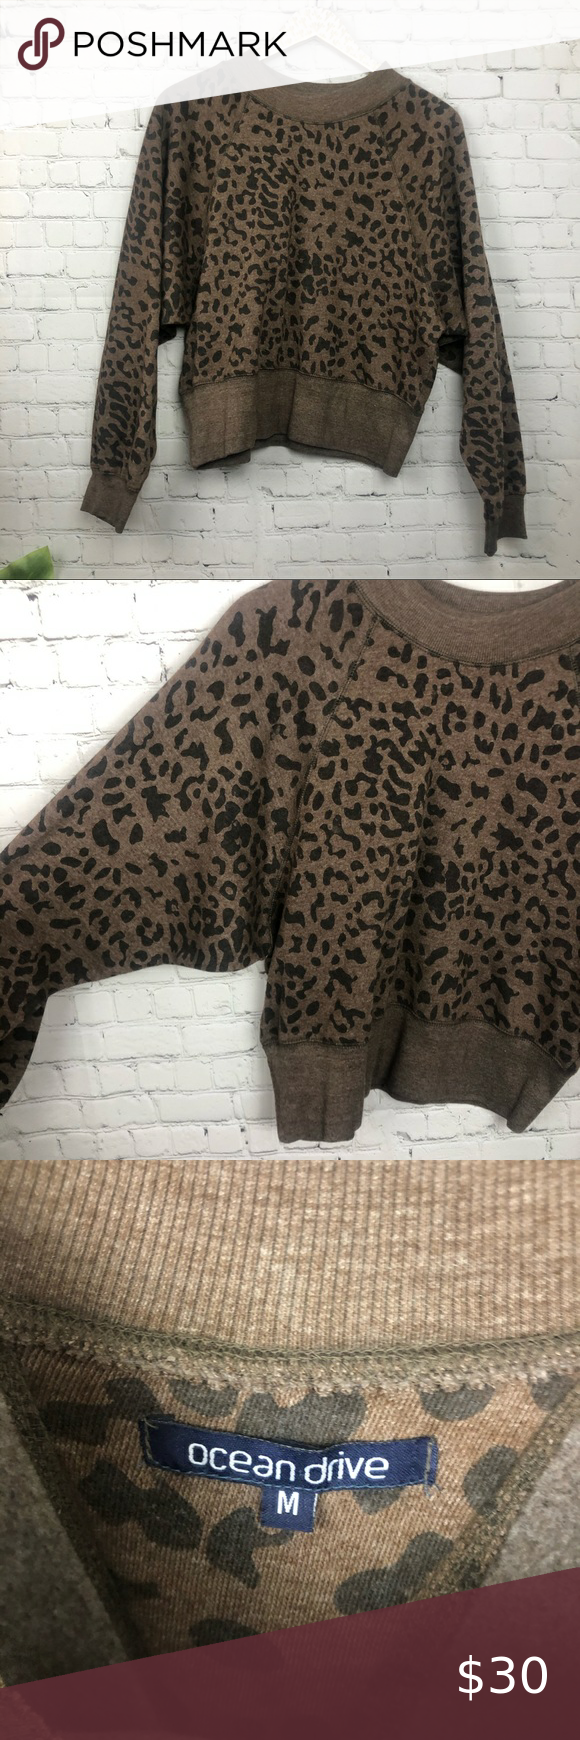 Ocean Drive Leopard Crewneck Size Medium Ocean Drive Leopard Crewneck Size Medium Preloved Excellent Condition Clothes Design Cropped Style Ocean Drive [ 1740 x 580 Pixel ]